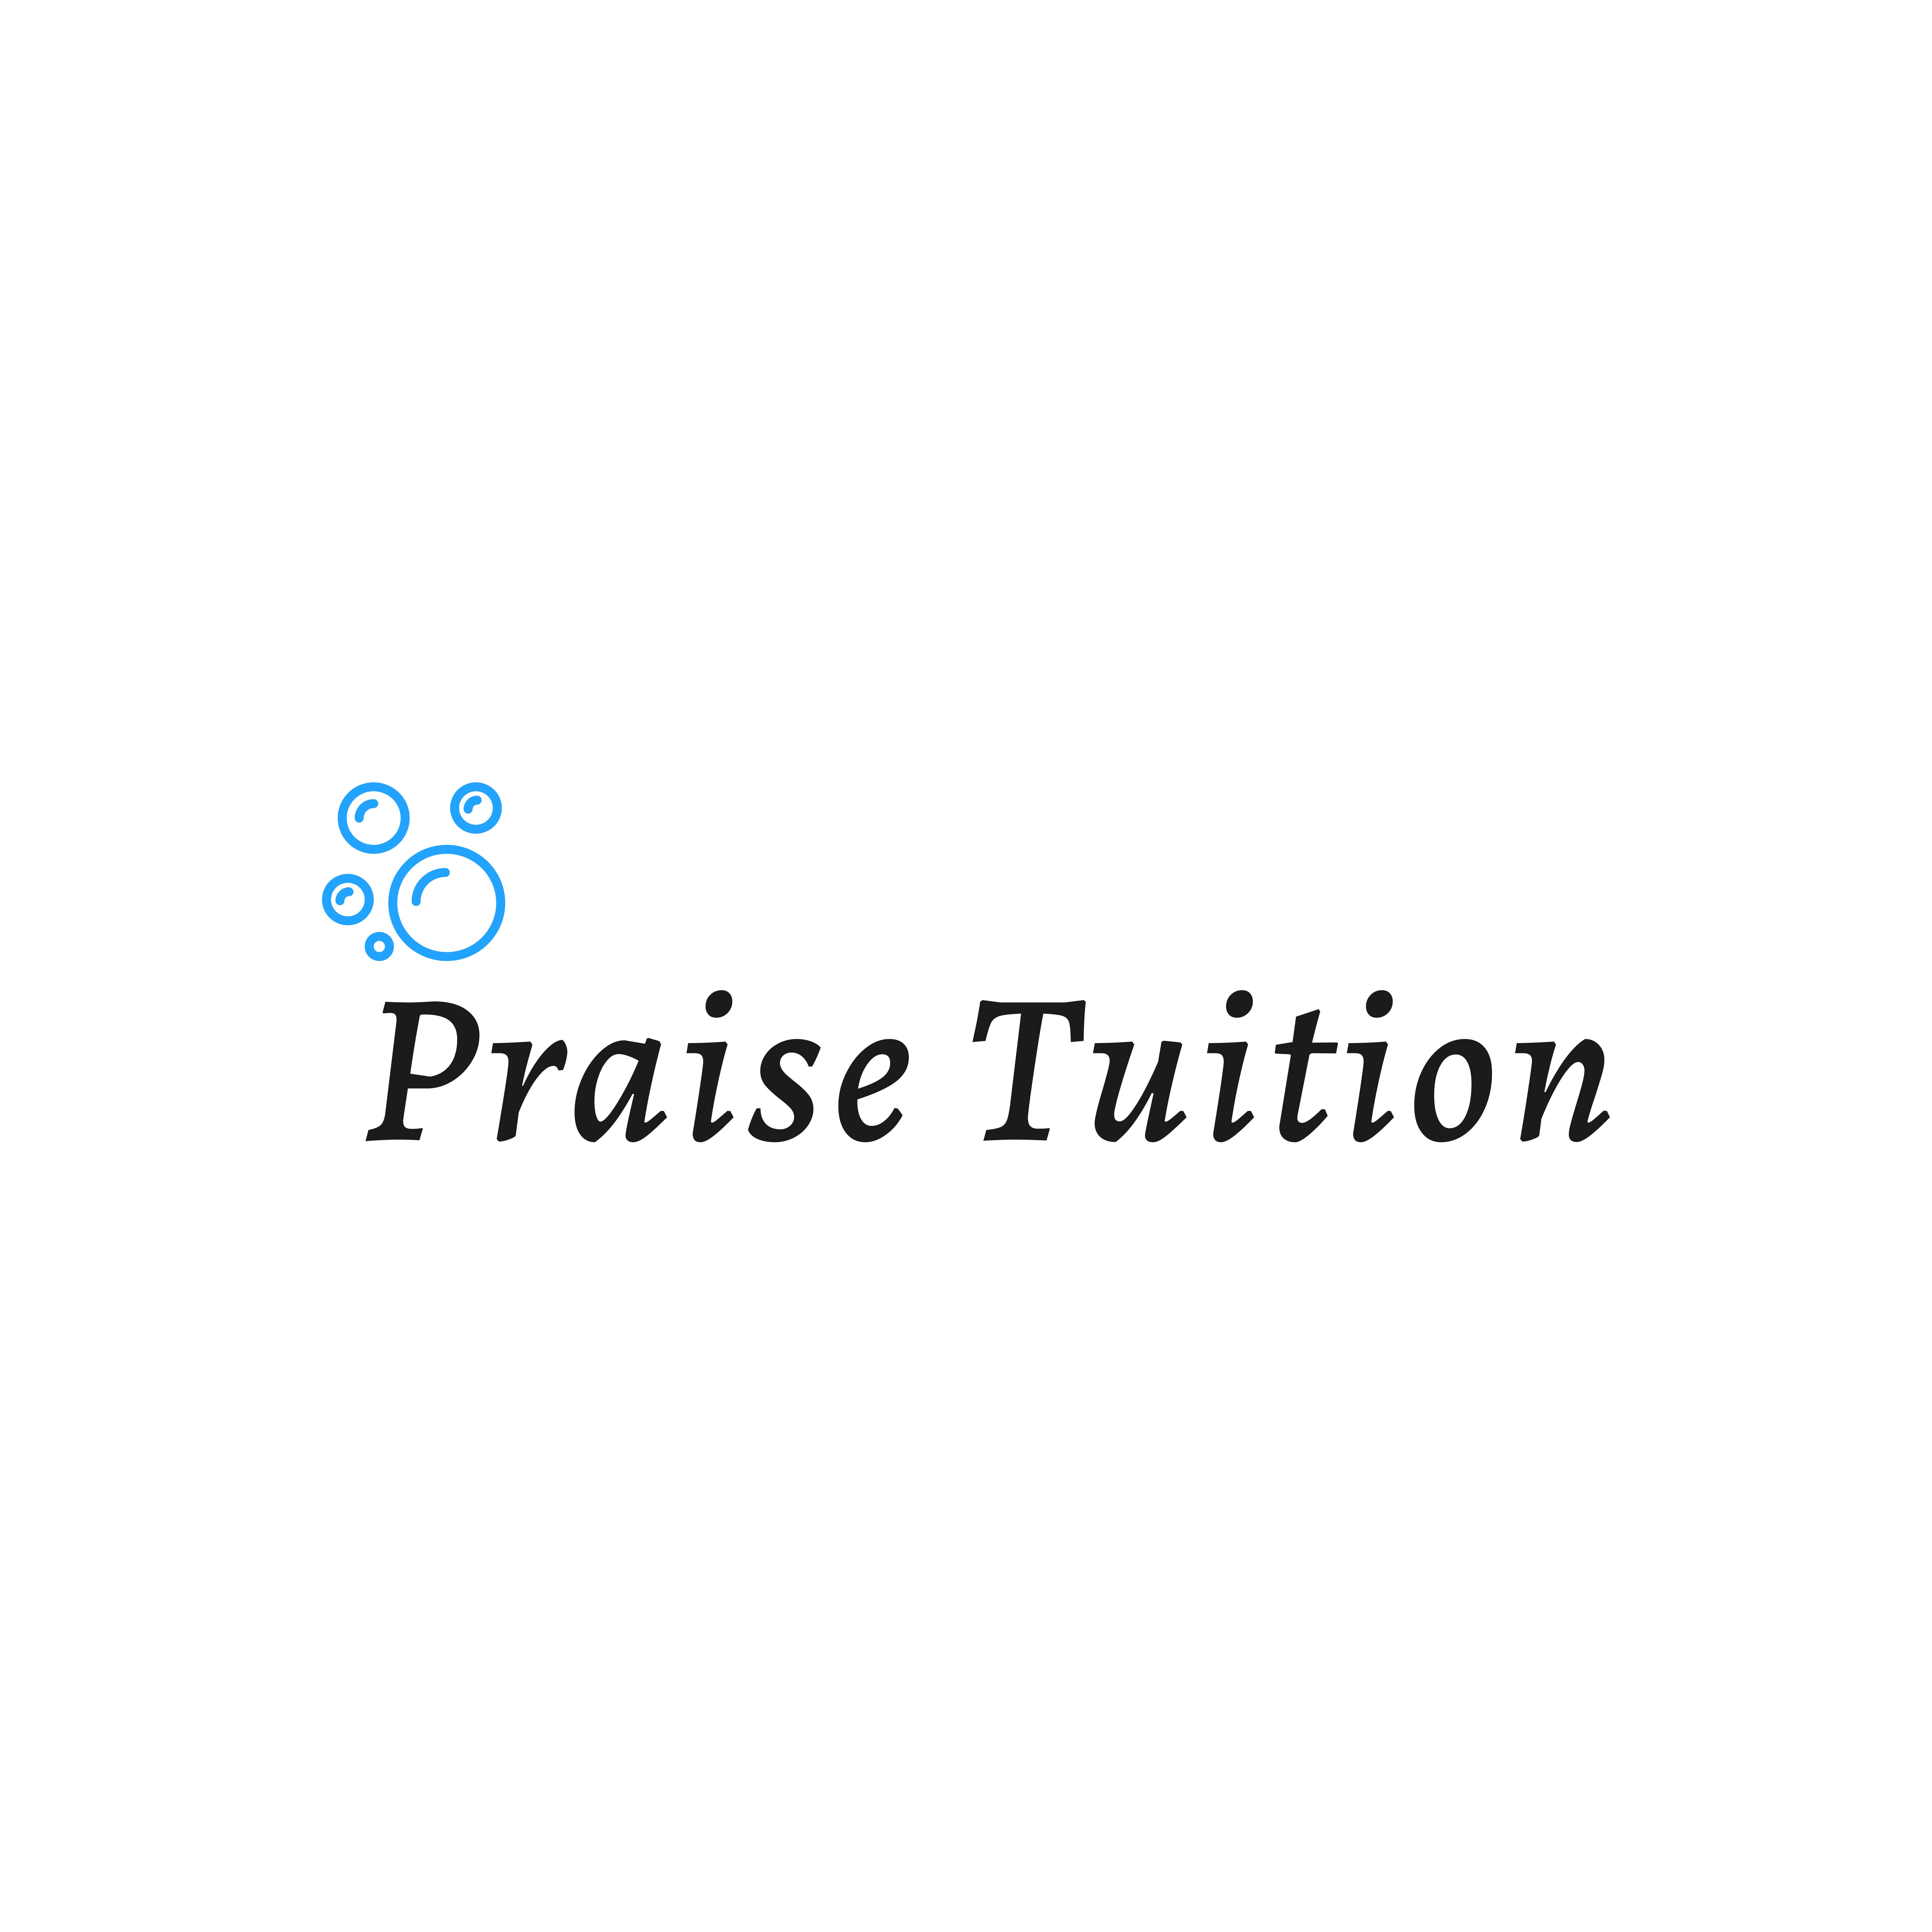 Praise Tuition 's logo